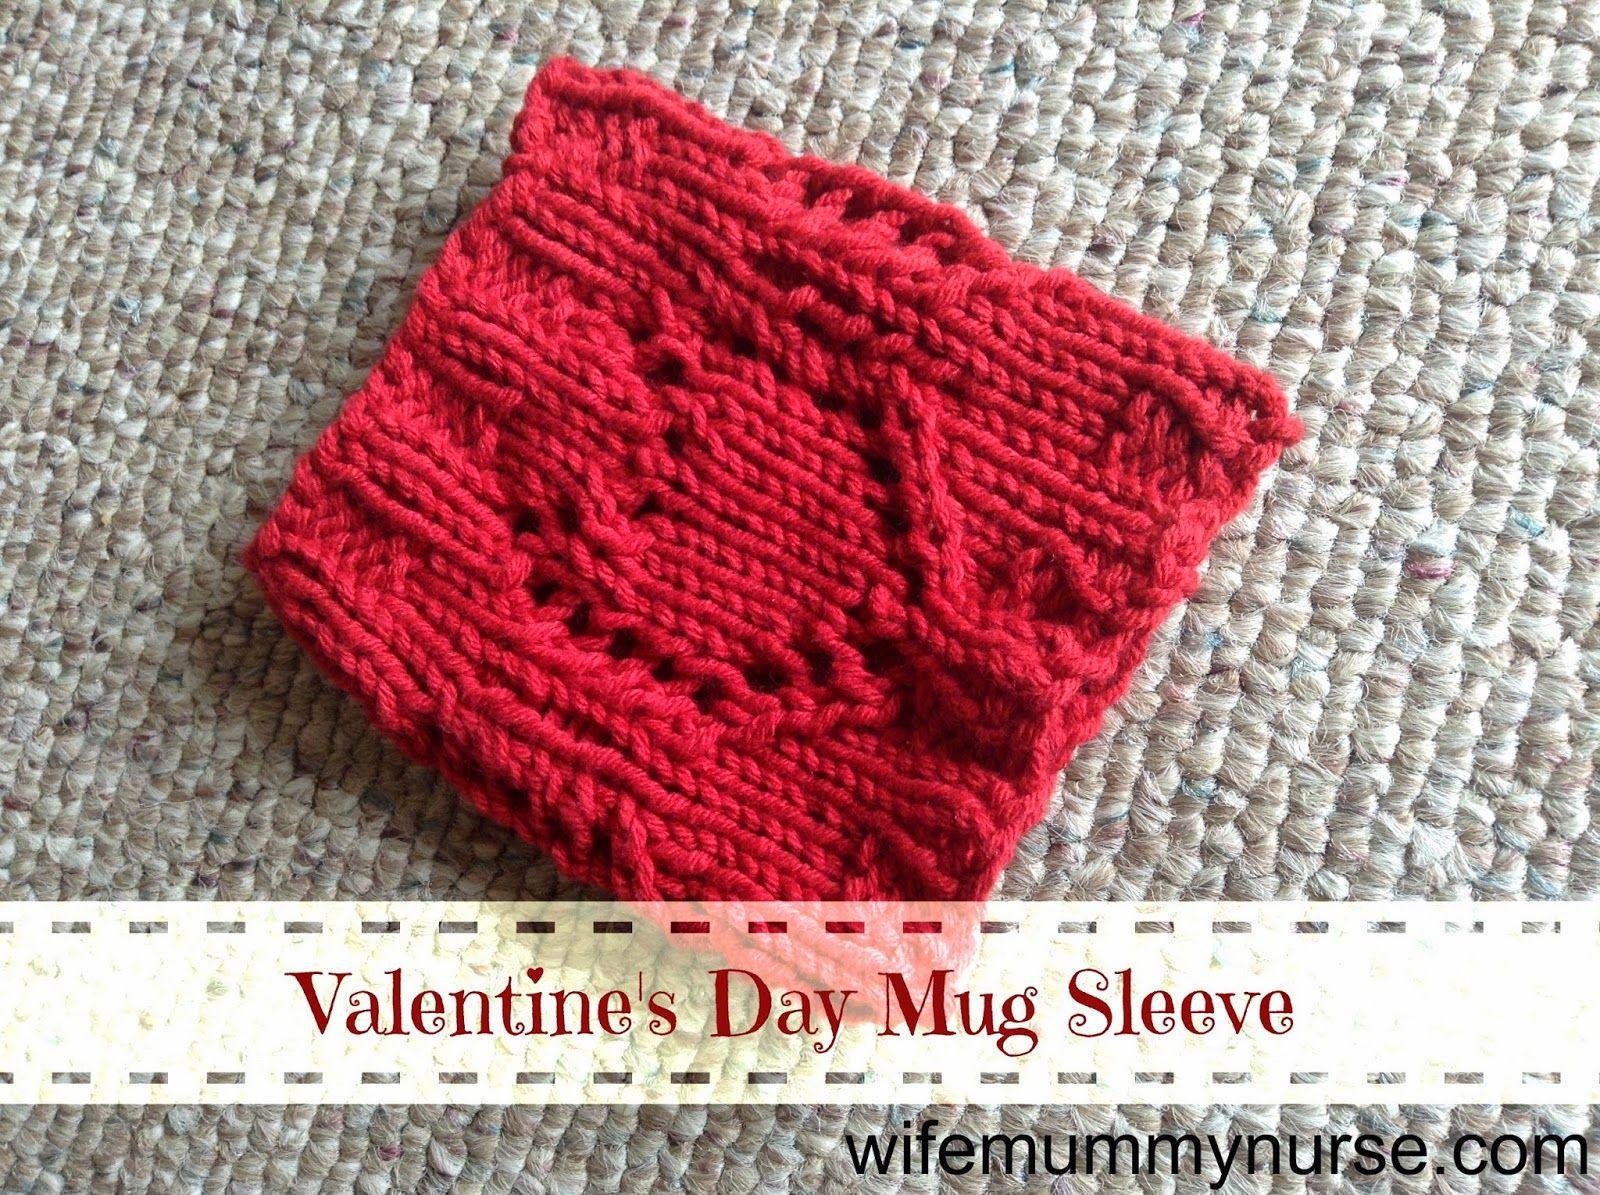 Wife, Mummy, Nurse: Valentine\'s Day Mug Sleeve + a Knitting Pattern ...